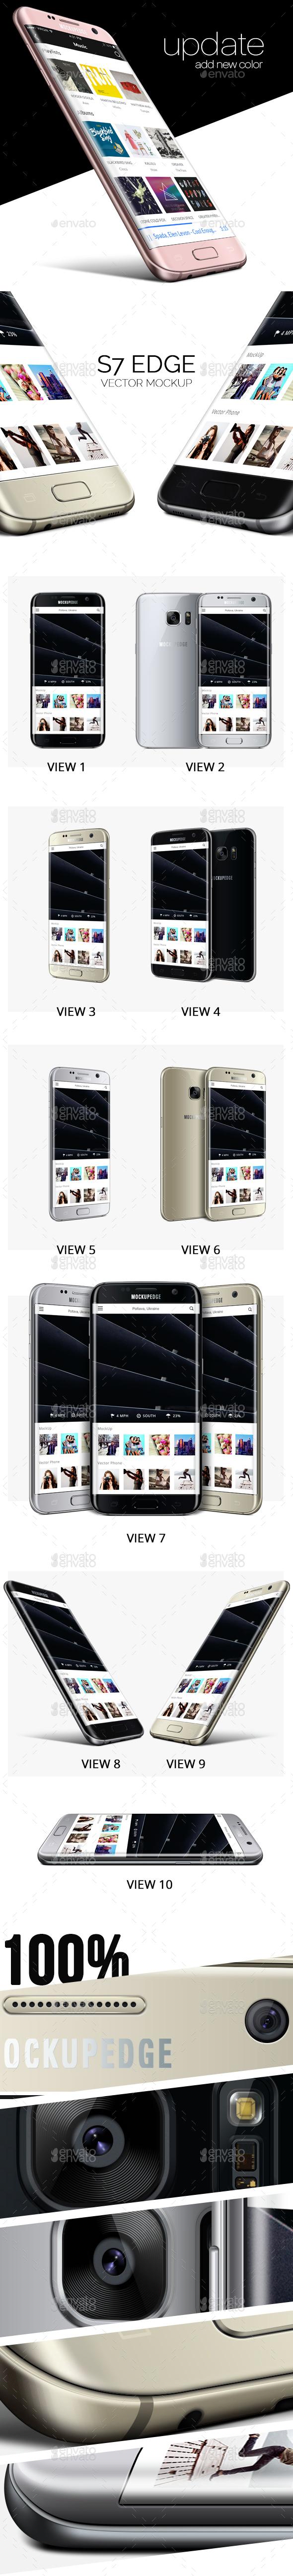 Galaxy S7 Edge Vector Mockup - Product Mock-Ups Graphics